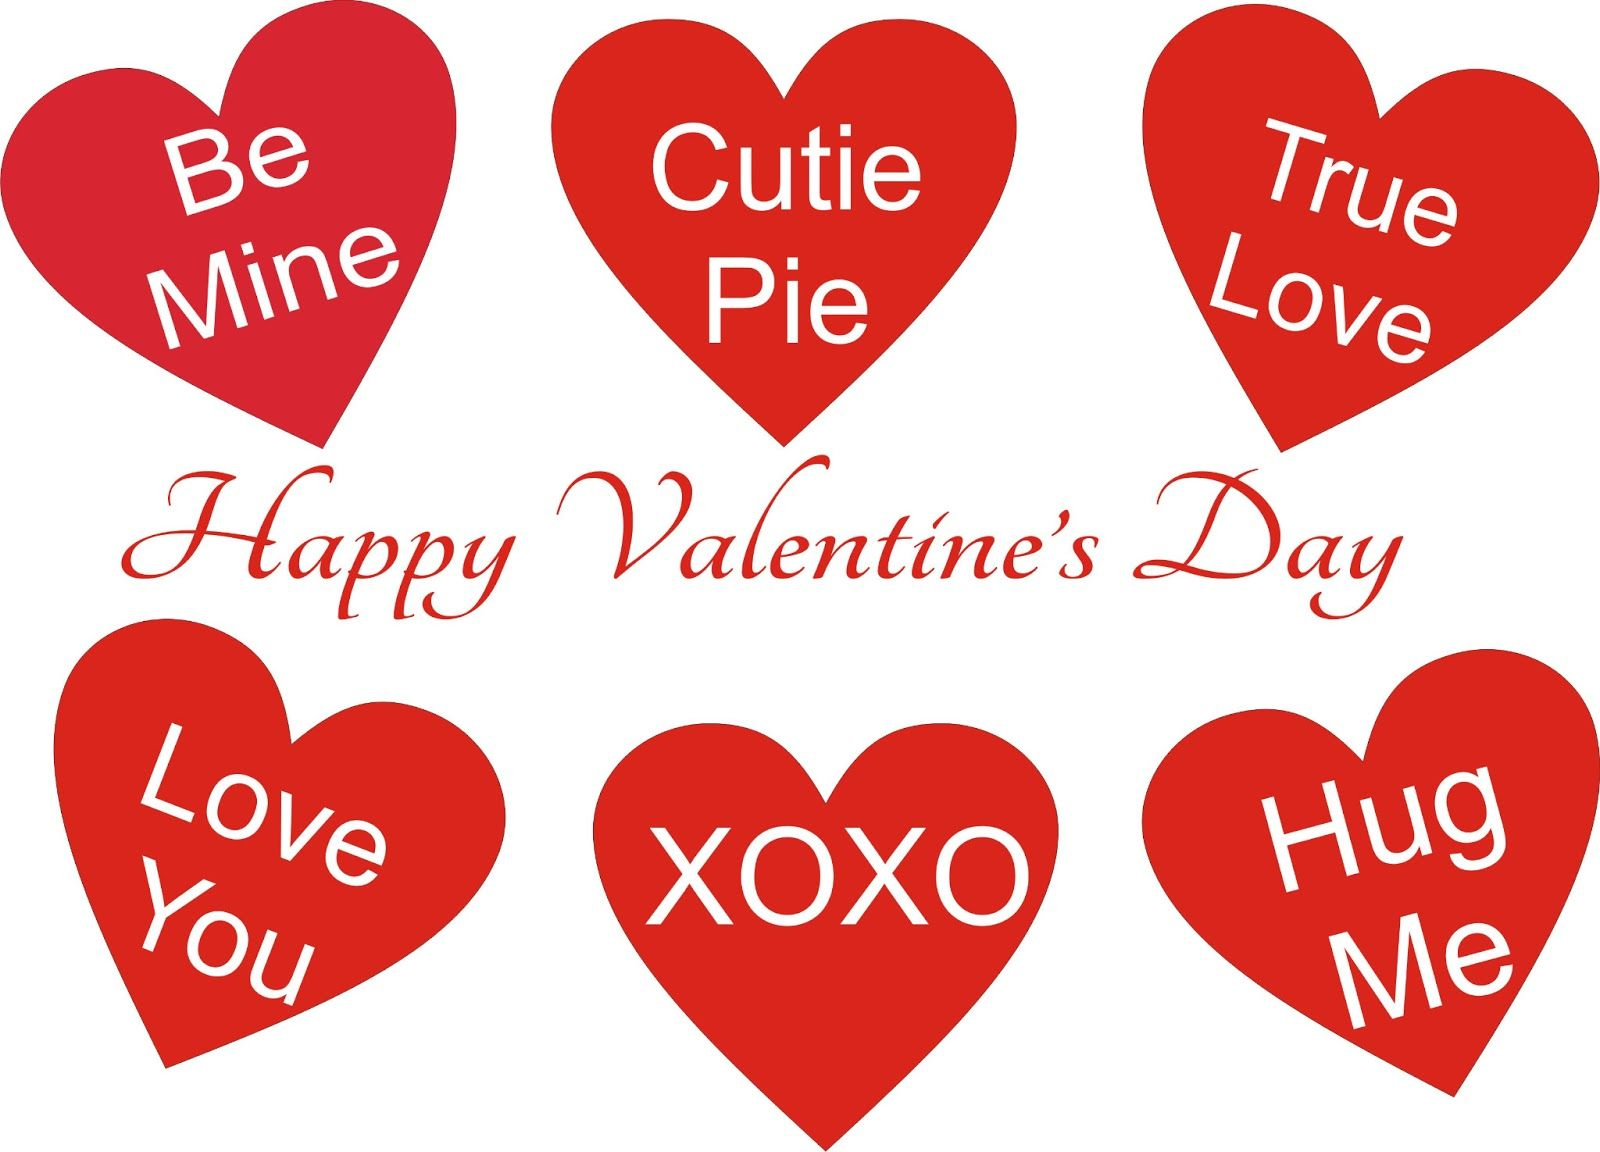 Best 25+ Happy valentines day wishes ideas on Pinterest